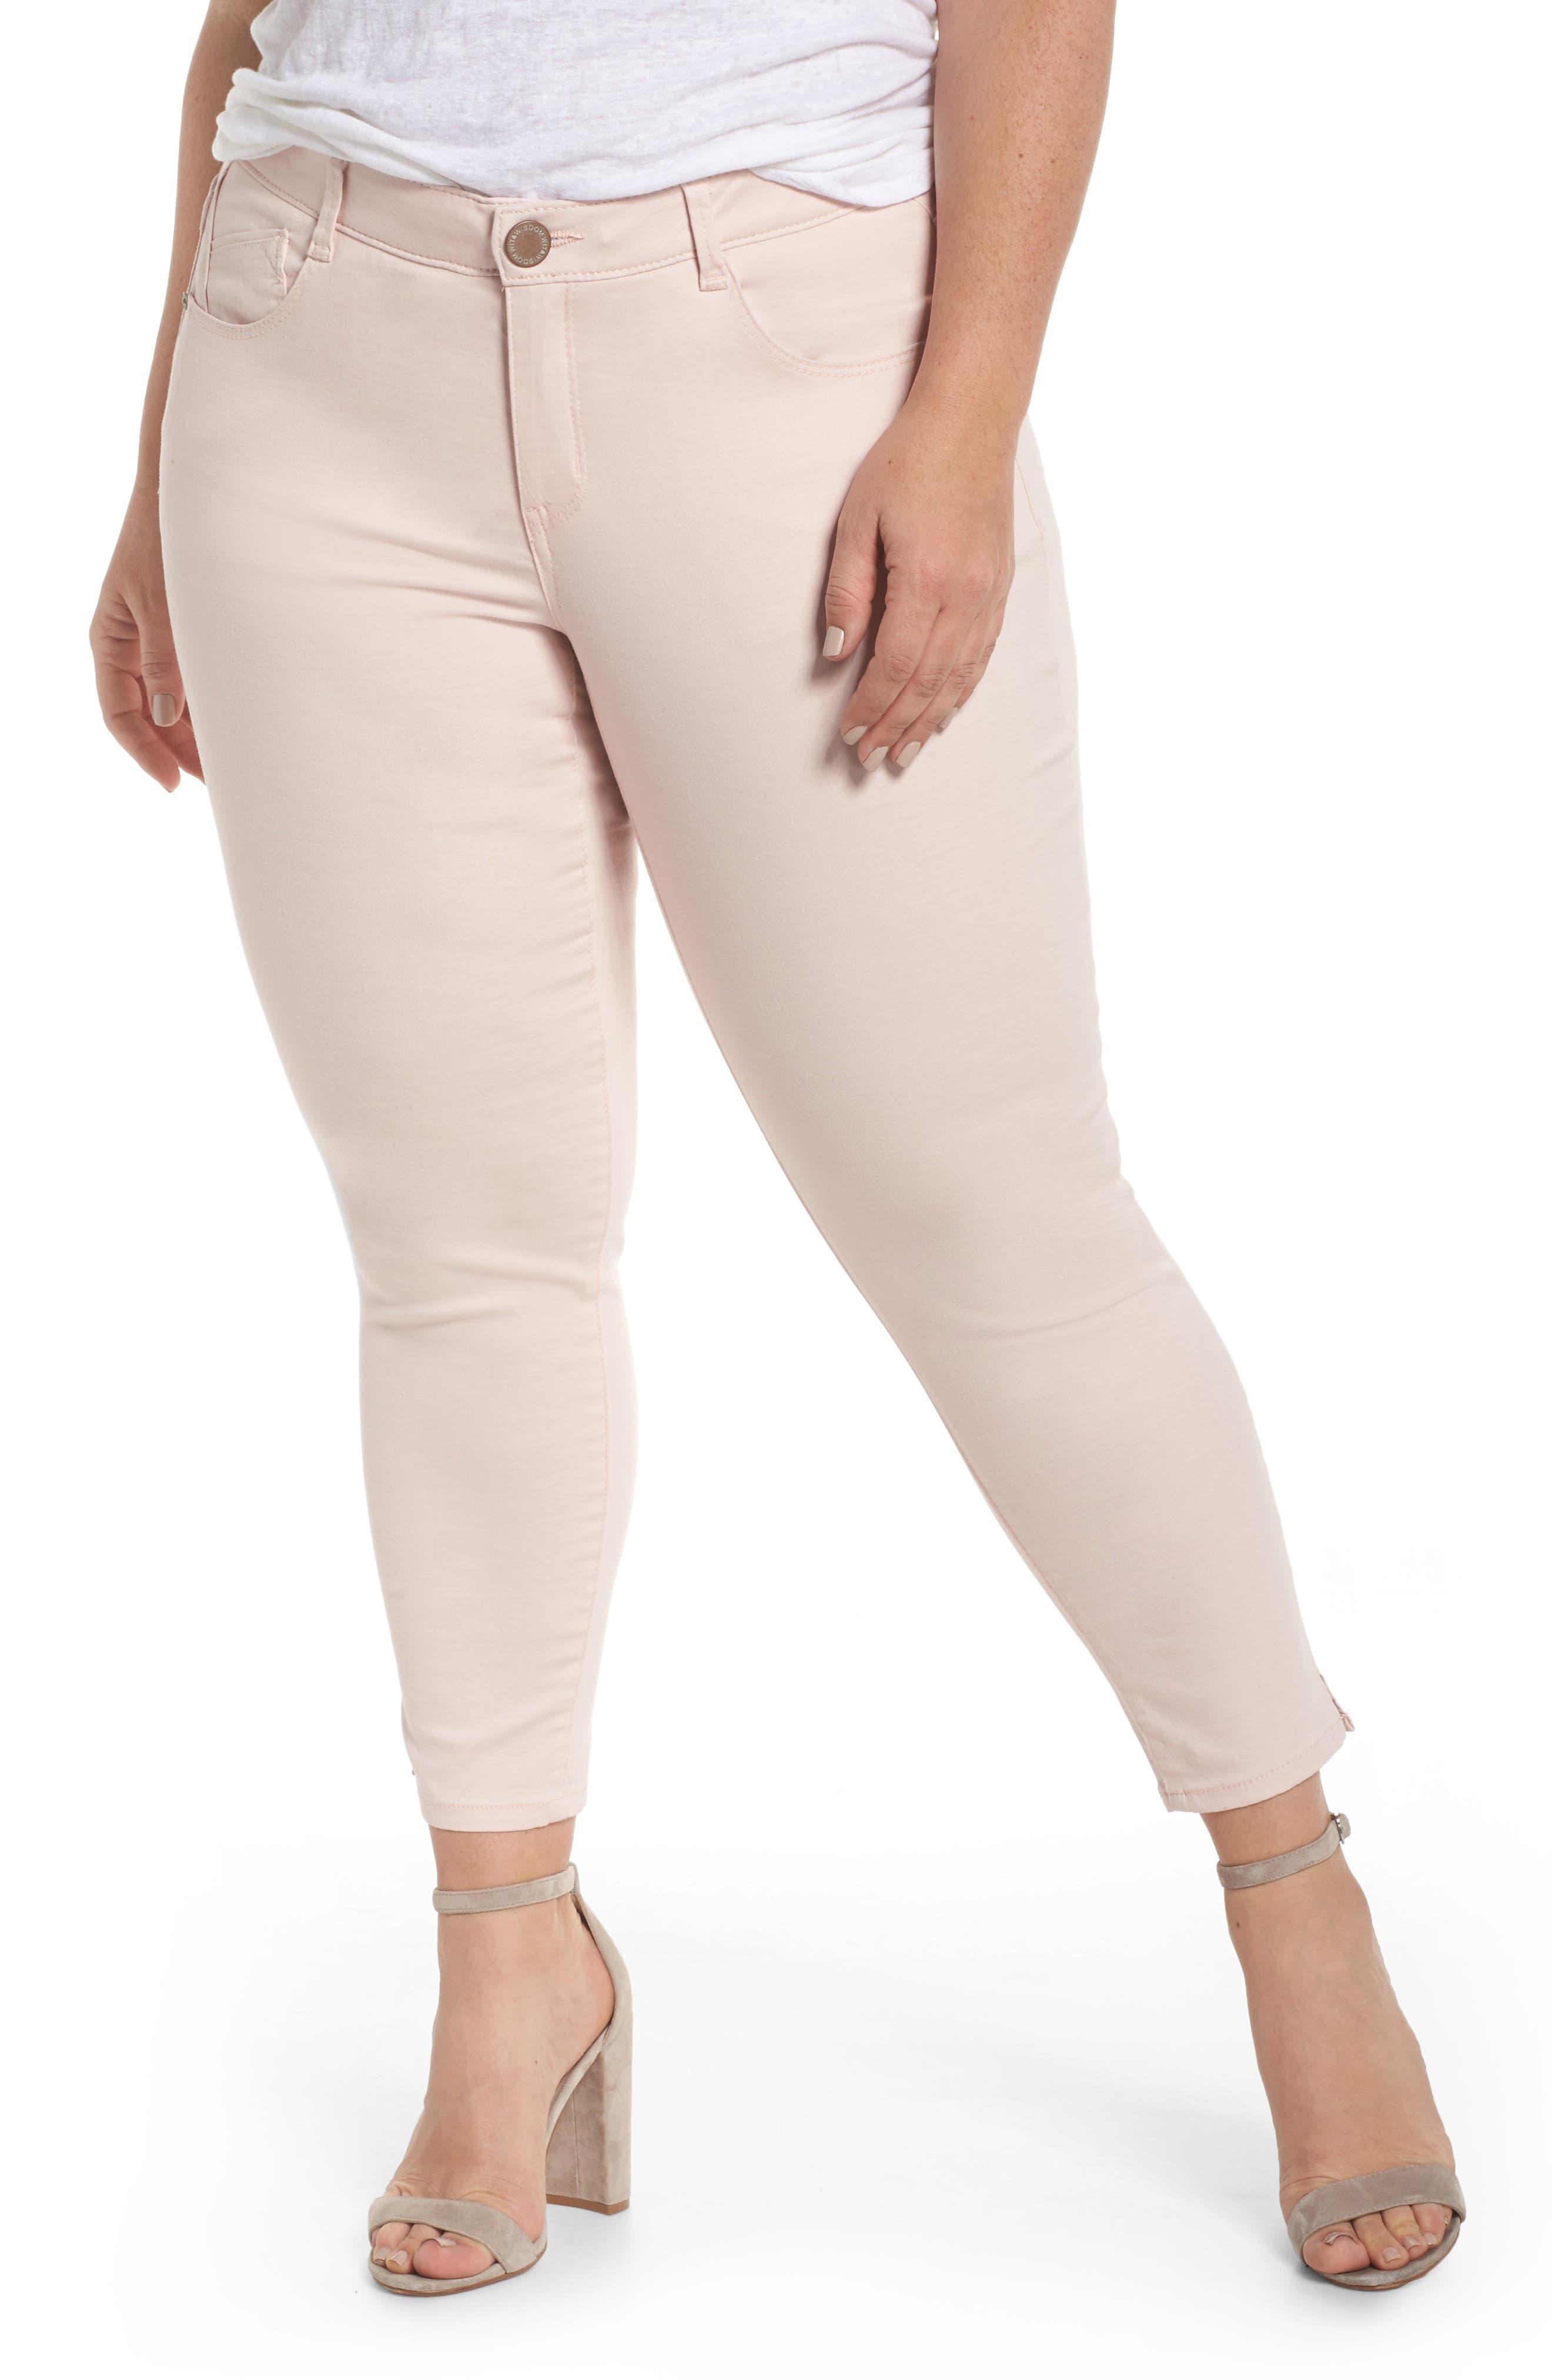 Wit & Wisdom Ab-solution Ankle Pants (Plus Size) (Nordstrom Exclusive)